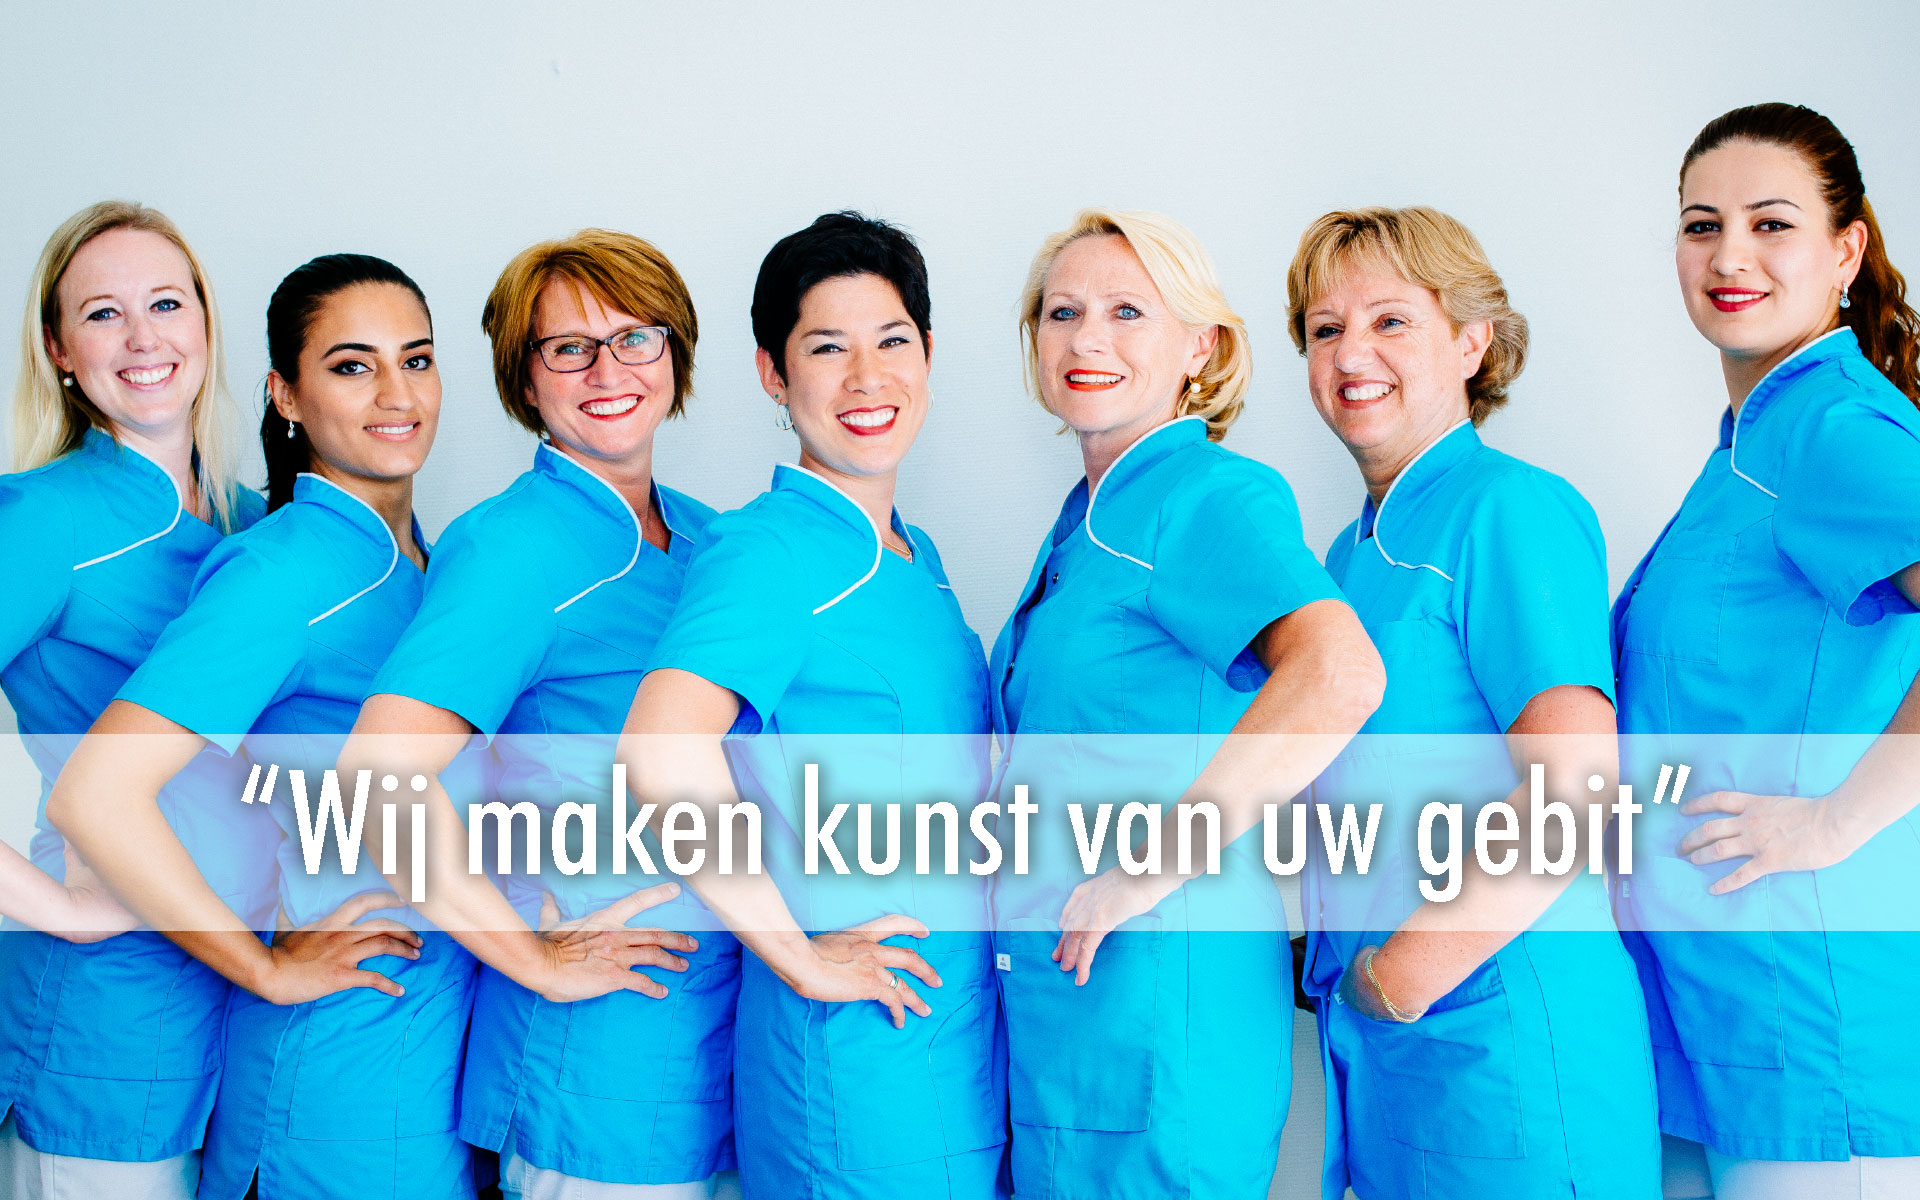 yu-lan-liem-micheal-tandartspraktijk